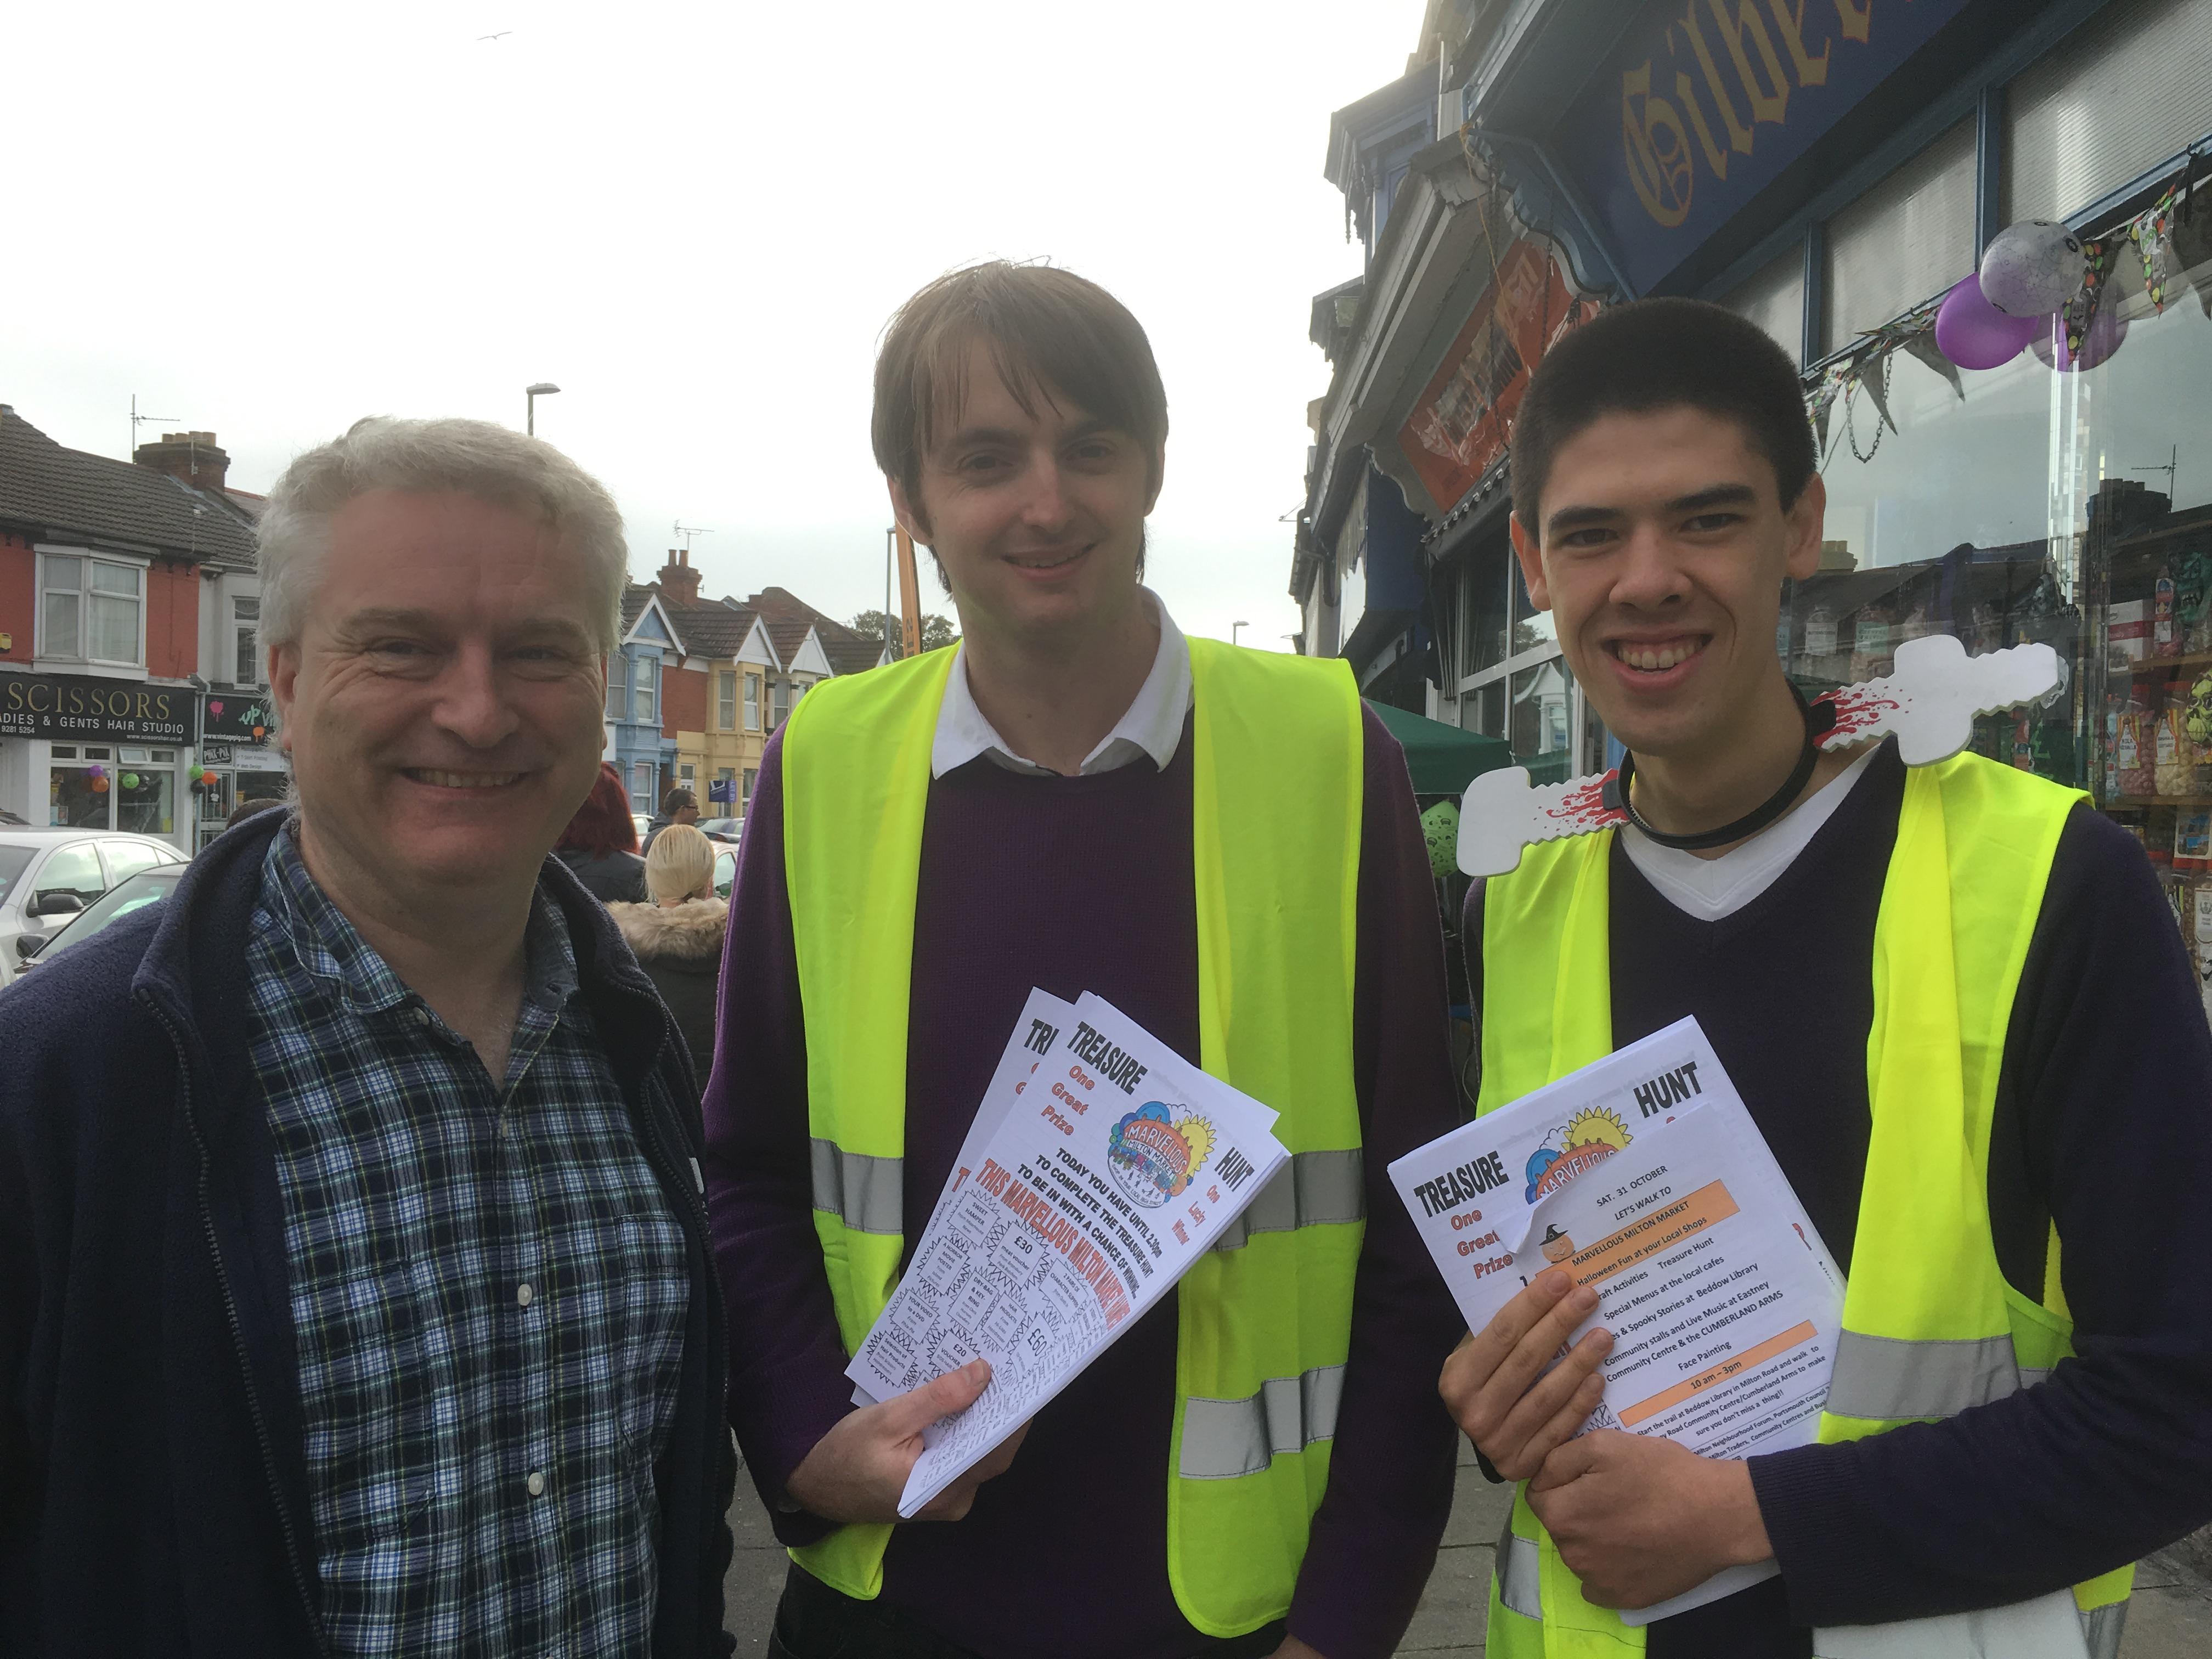 Marvellous Milton Market Day - A Big Success